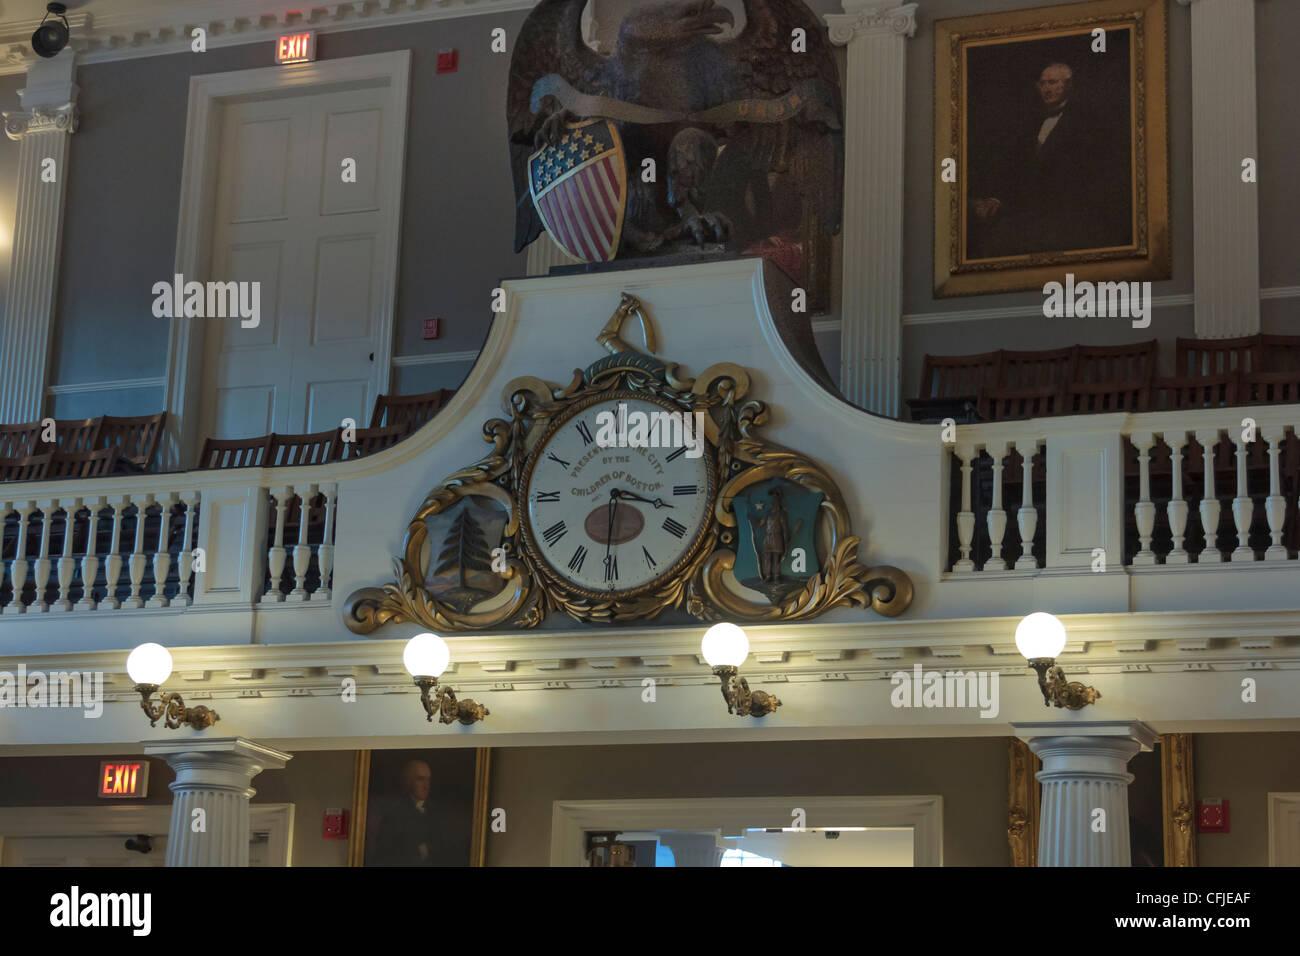 Antique Clock in Faneiul Hall, Boston, Massachusetts - Stock Image